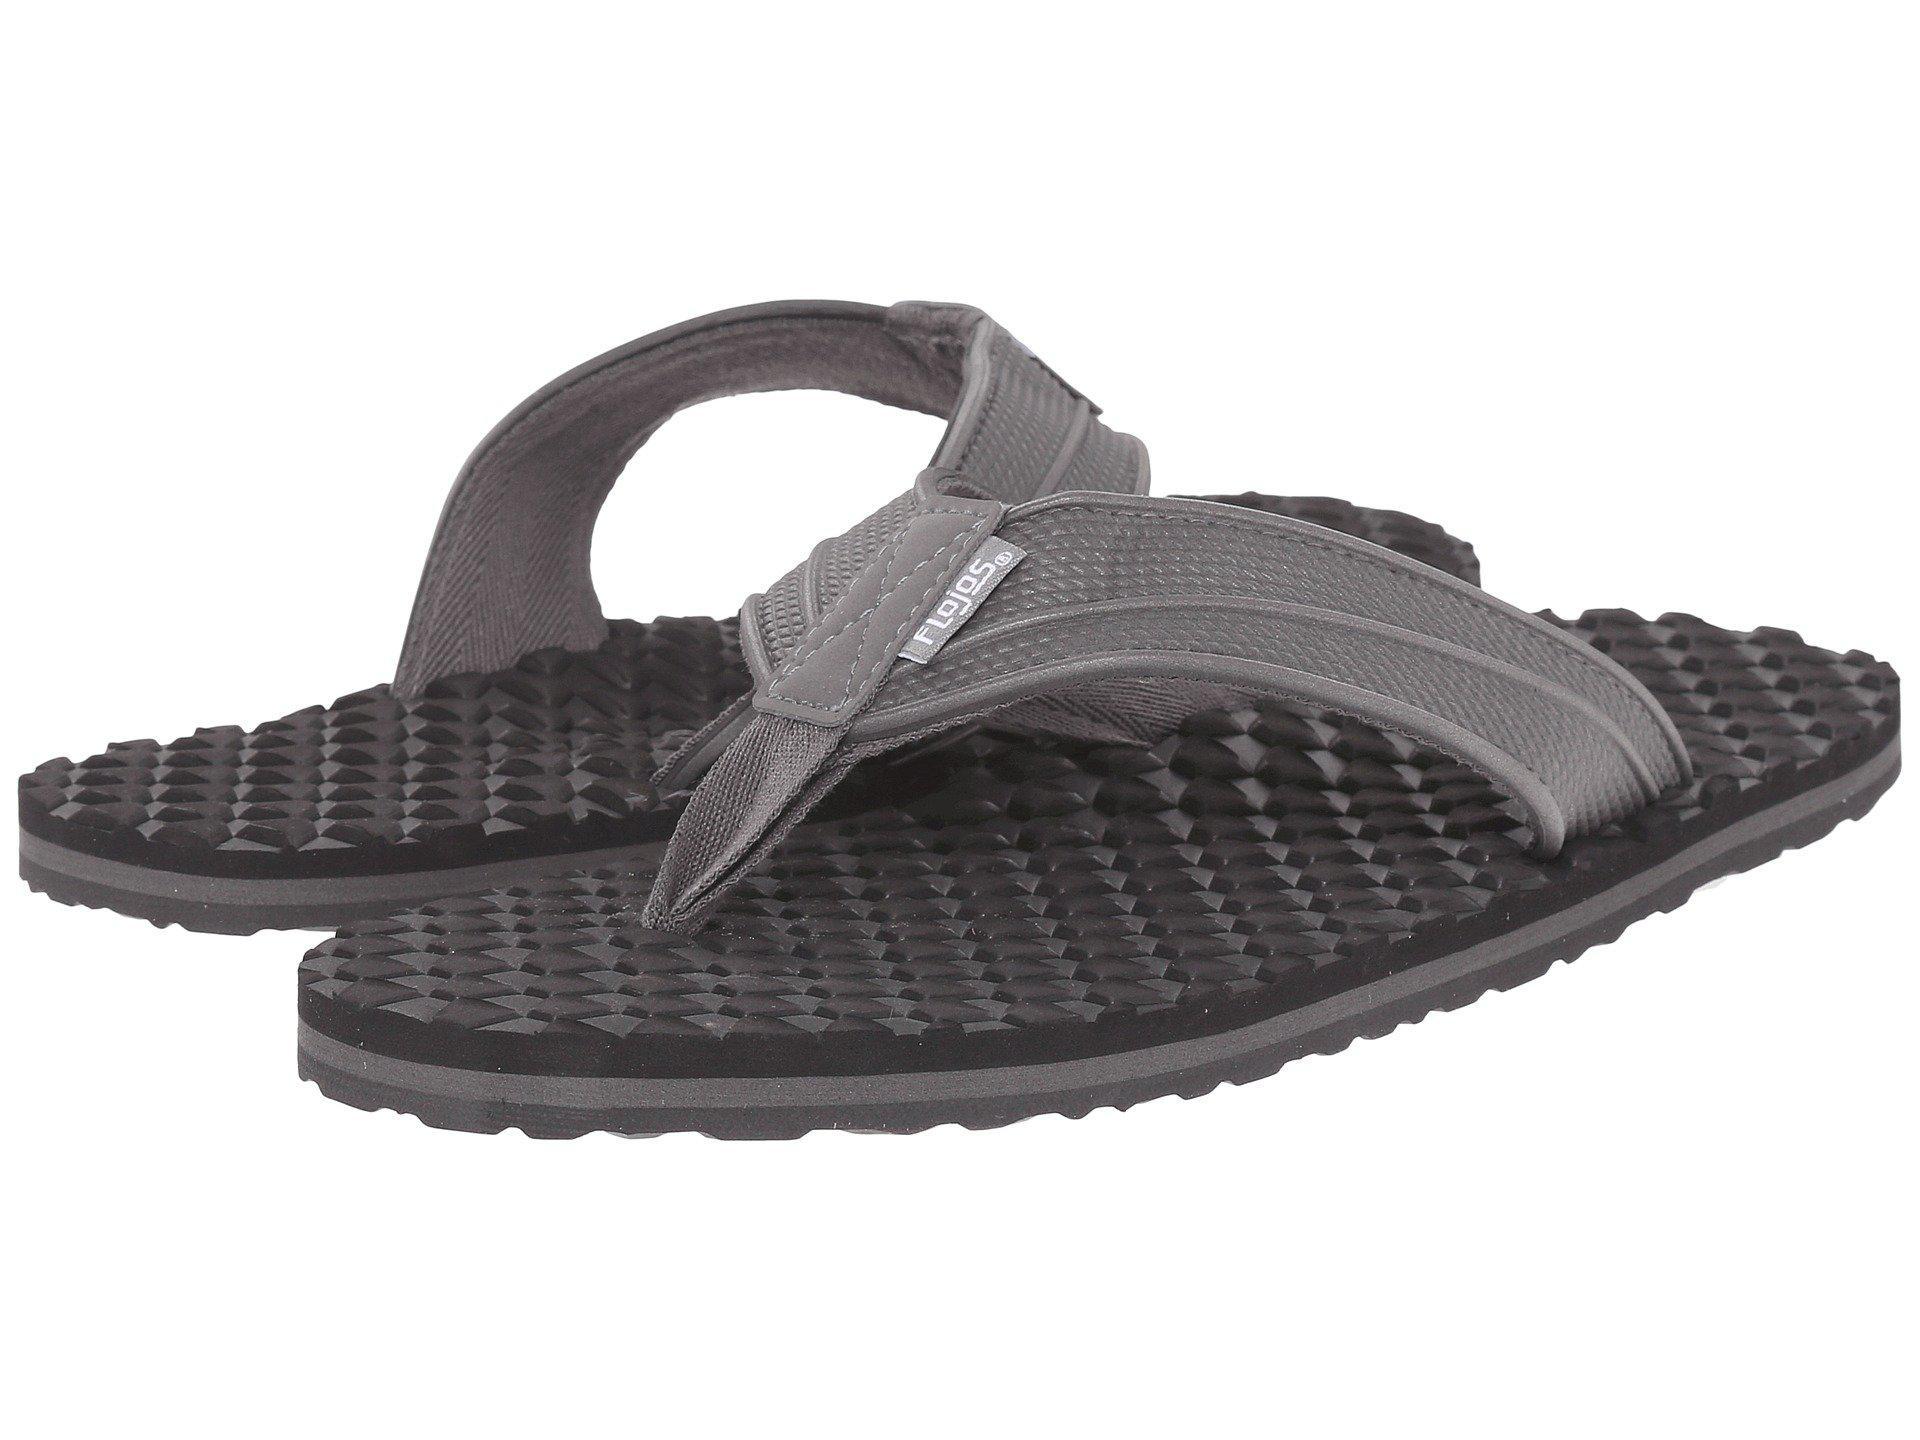 6a5bd4fd588e Lyst - Flojos Badlands (black light Gray) Men s Sandals in Gray for Men